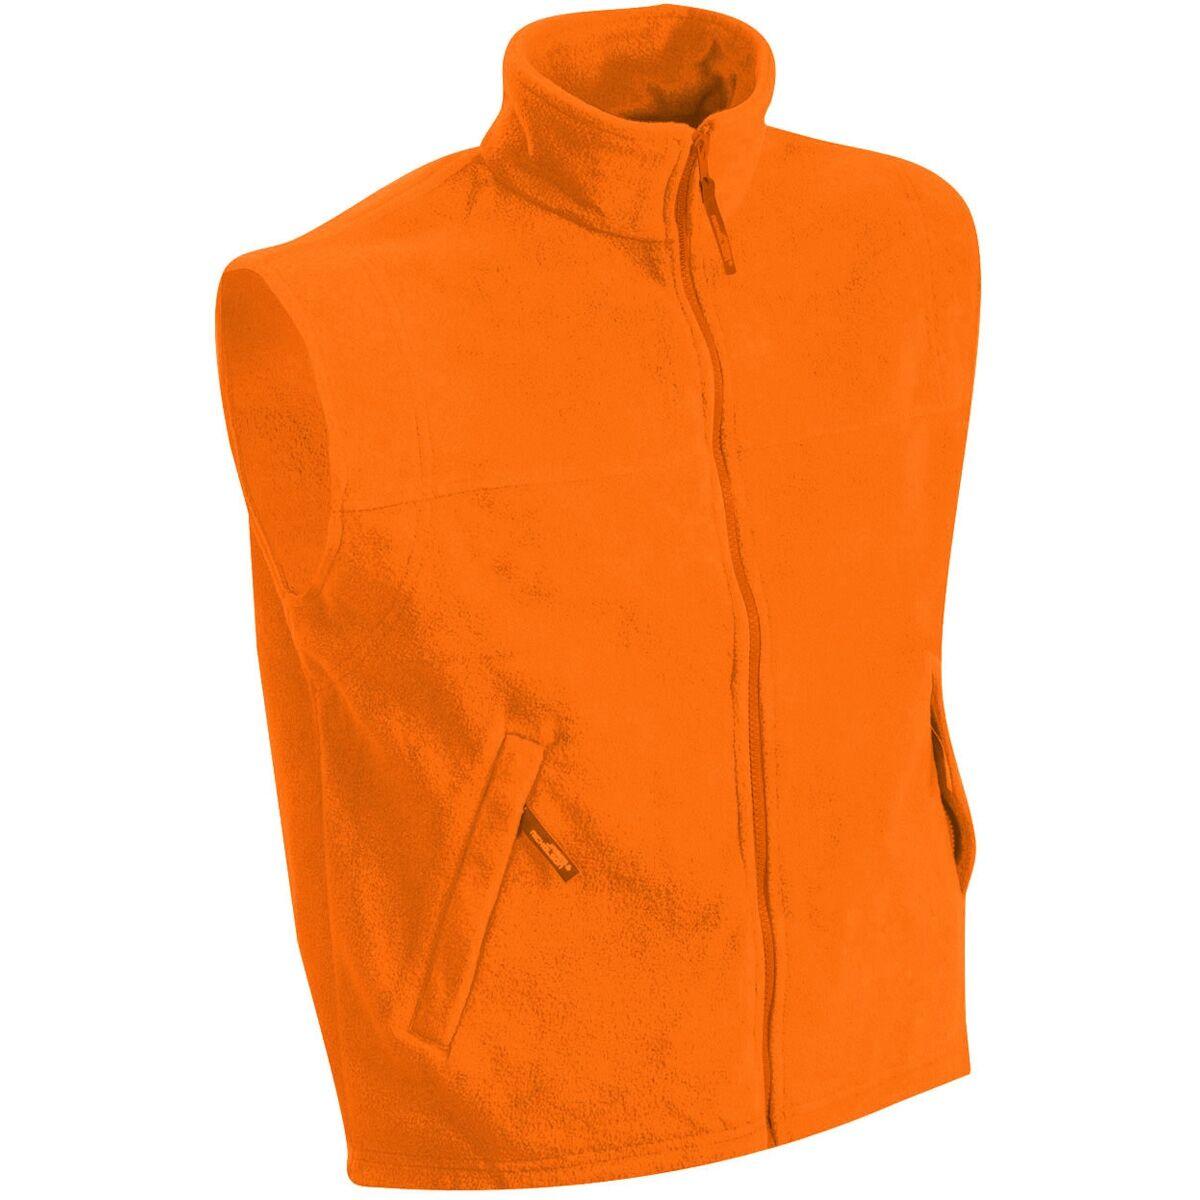 Gilet sans manches bodywarmer polaire homme - JN045 - orange